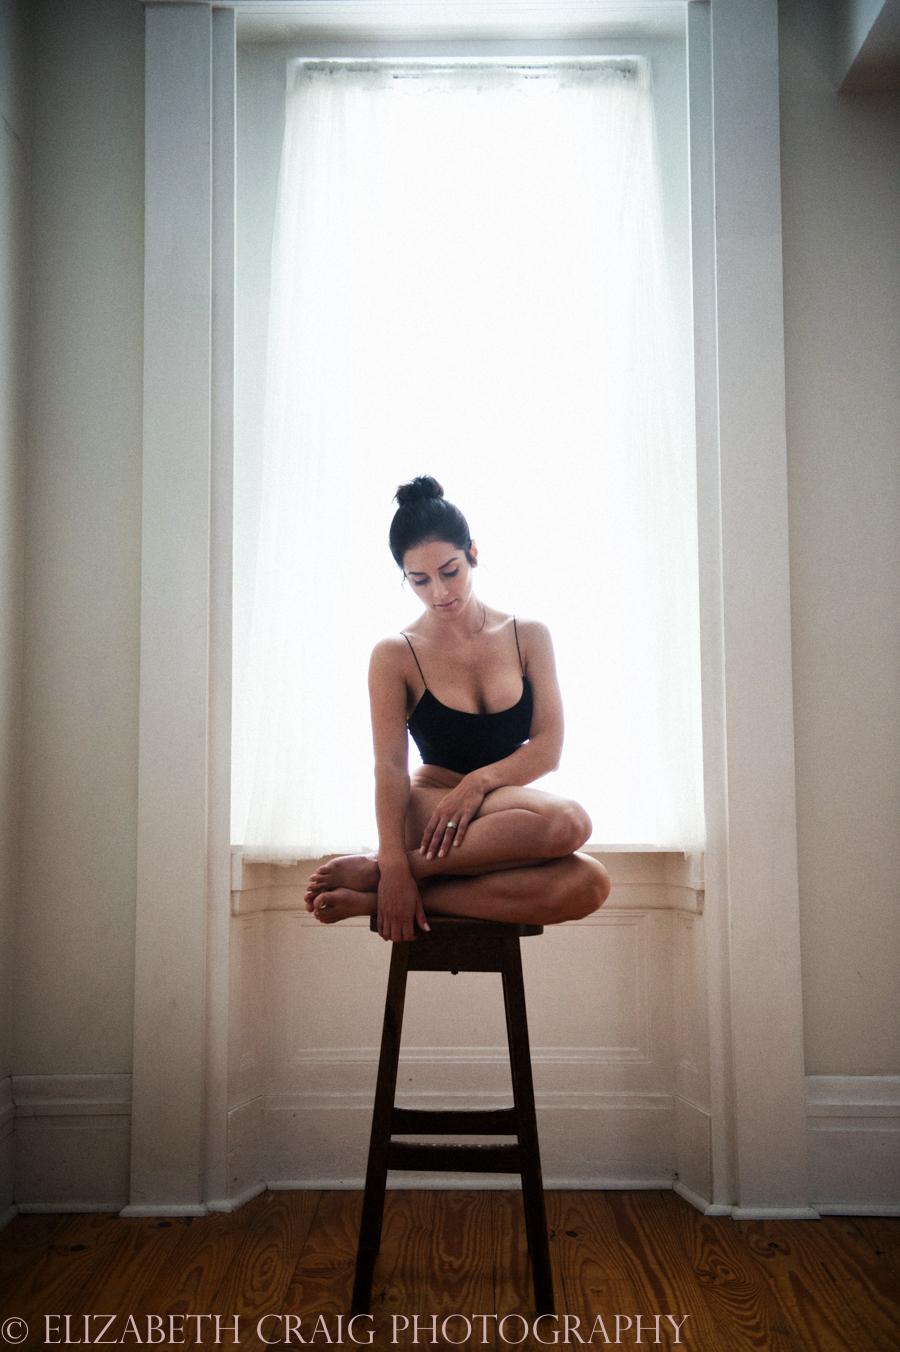 pittsburgh-boudoir-photographer-elizabeth-craig-photography-003